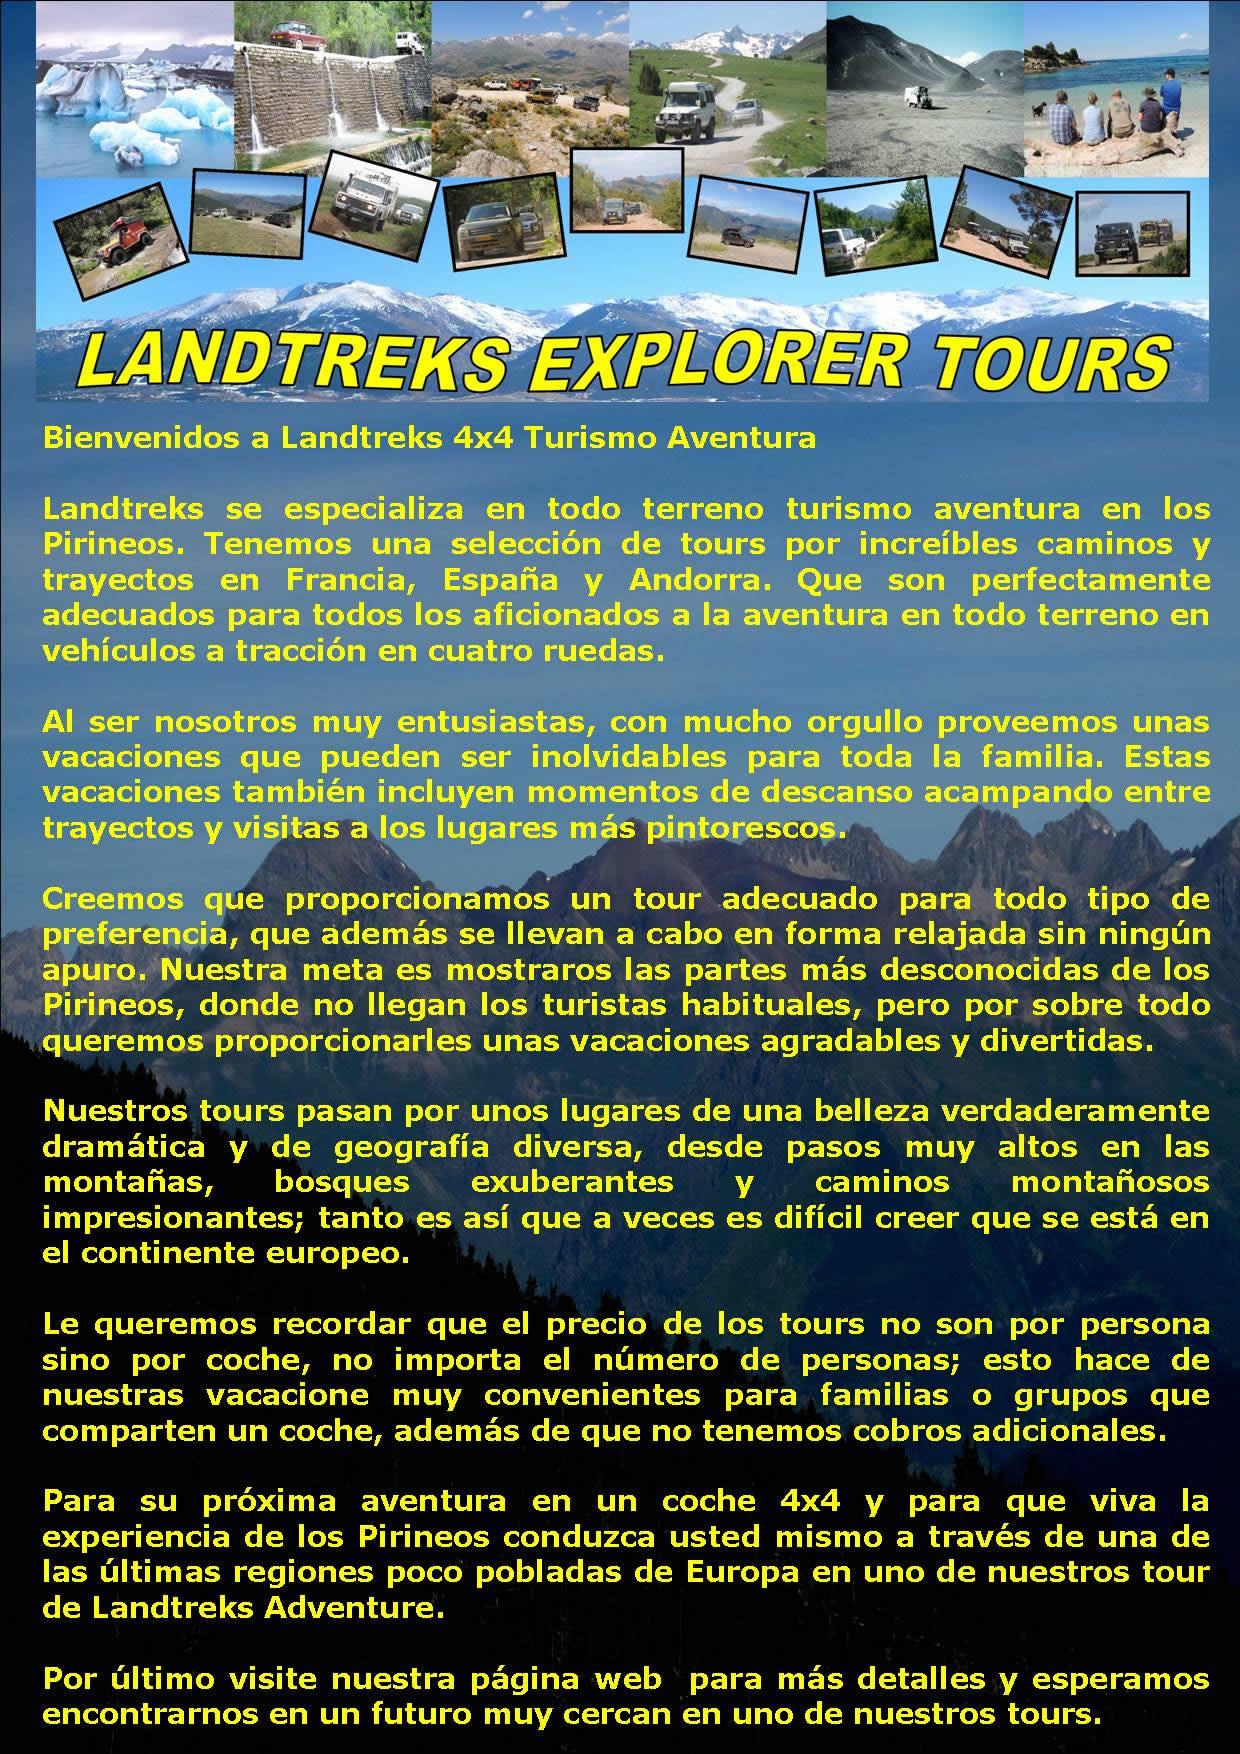 Landtreks - Specialists in Pyrenees 4x4 Adventure Tours - Spain ...